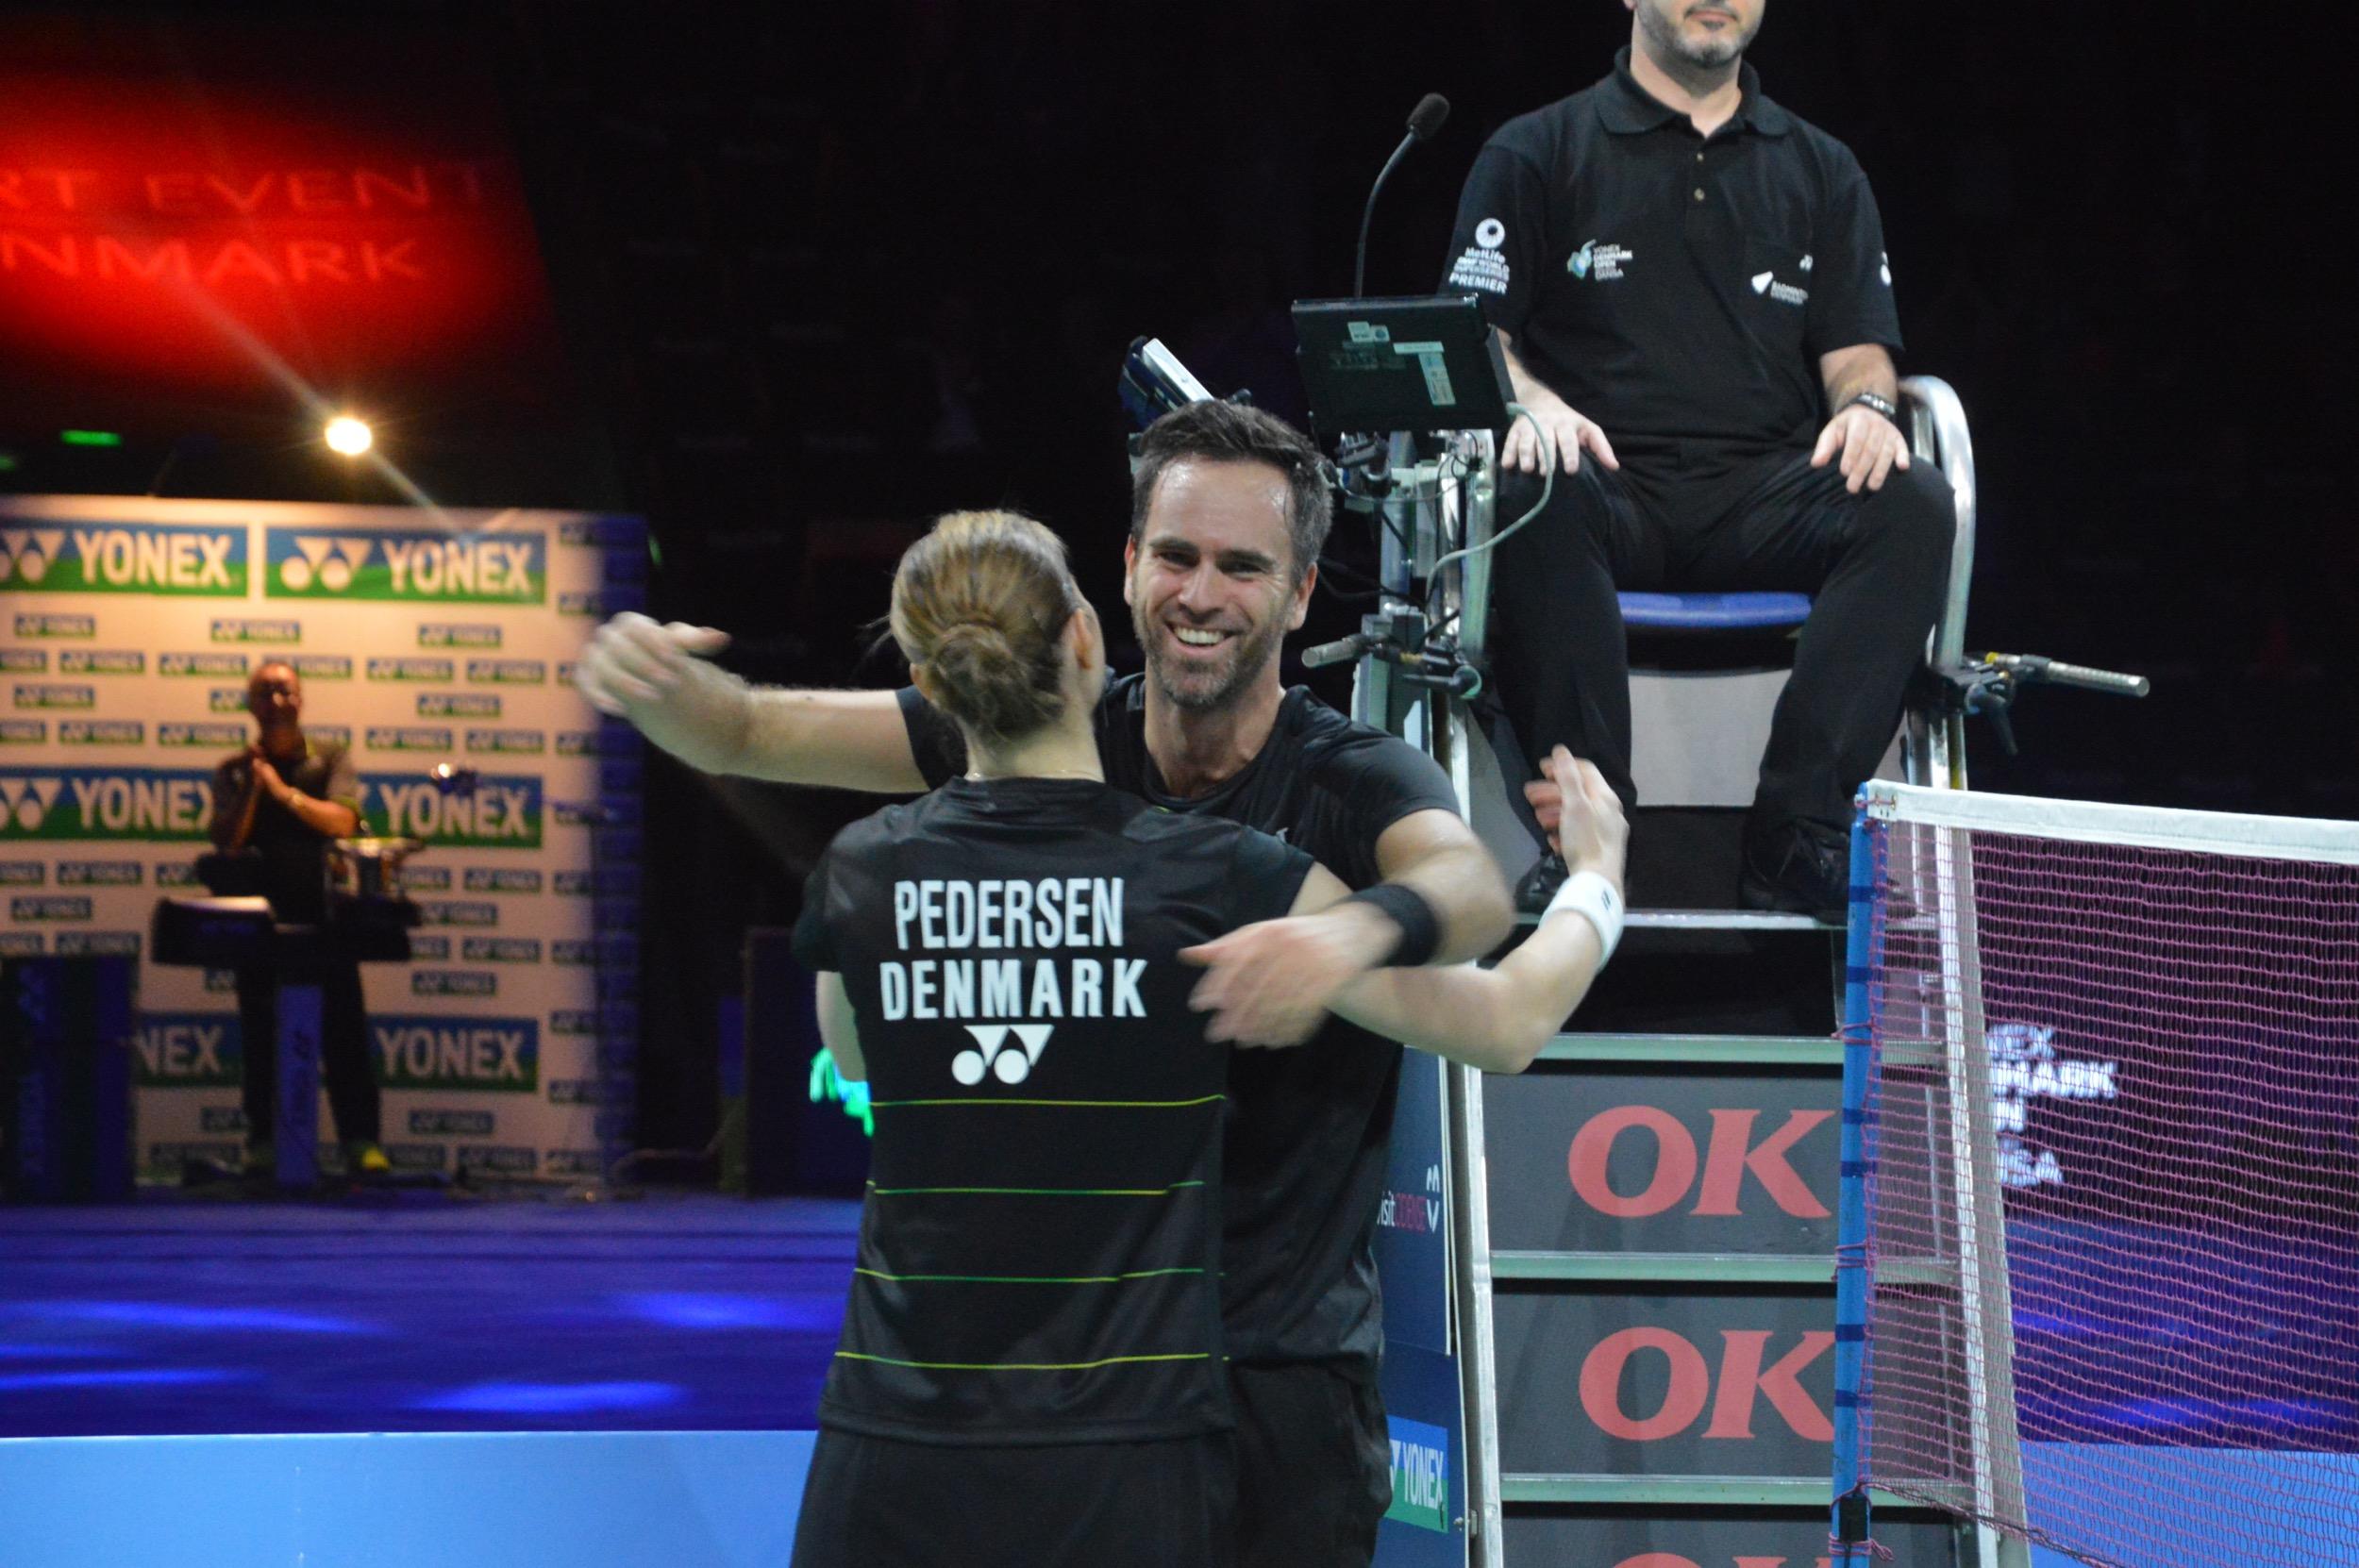 Mads Conrad Petersen – BadmintonBladet